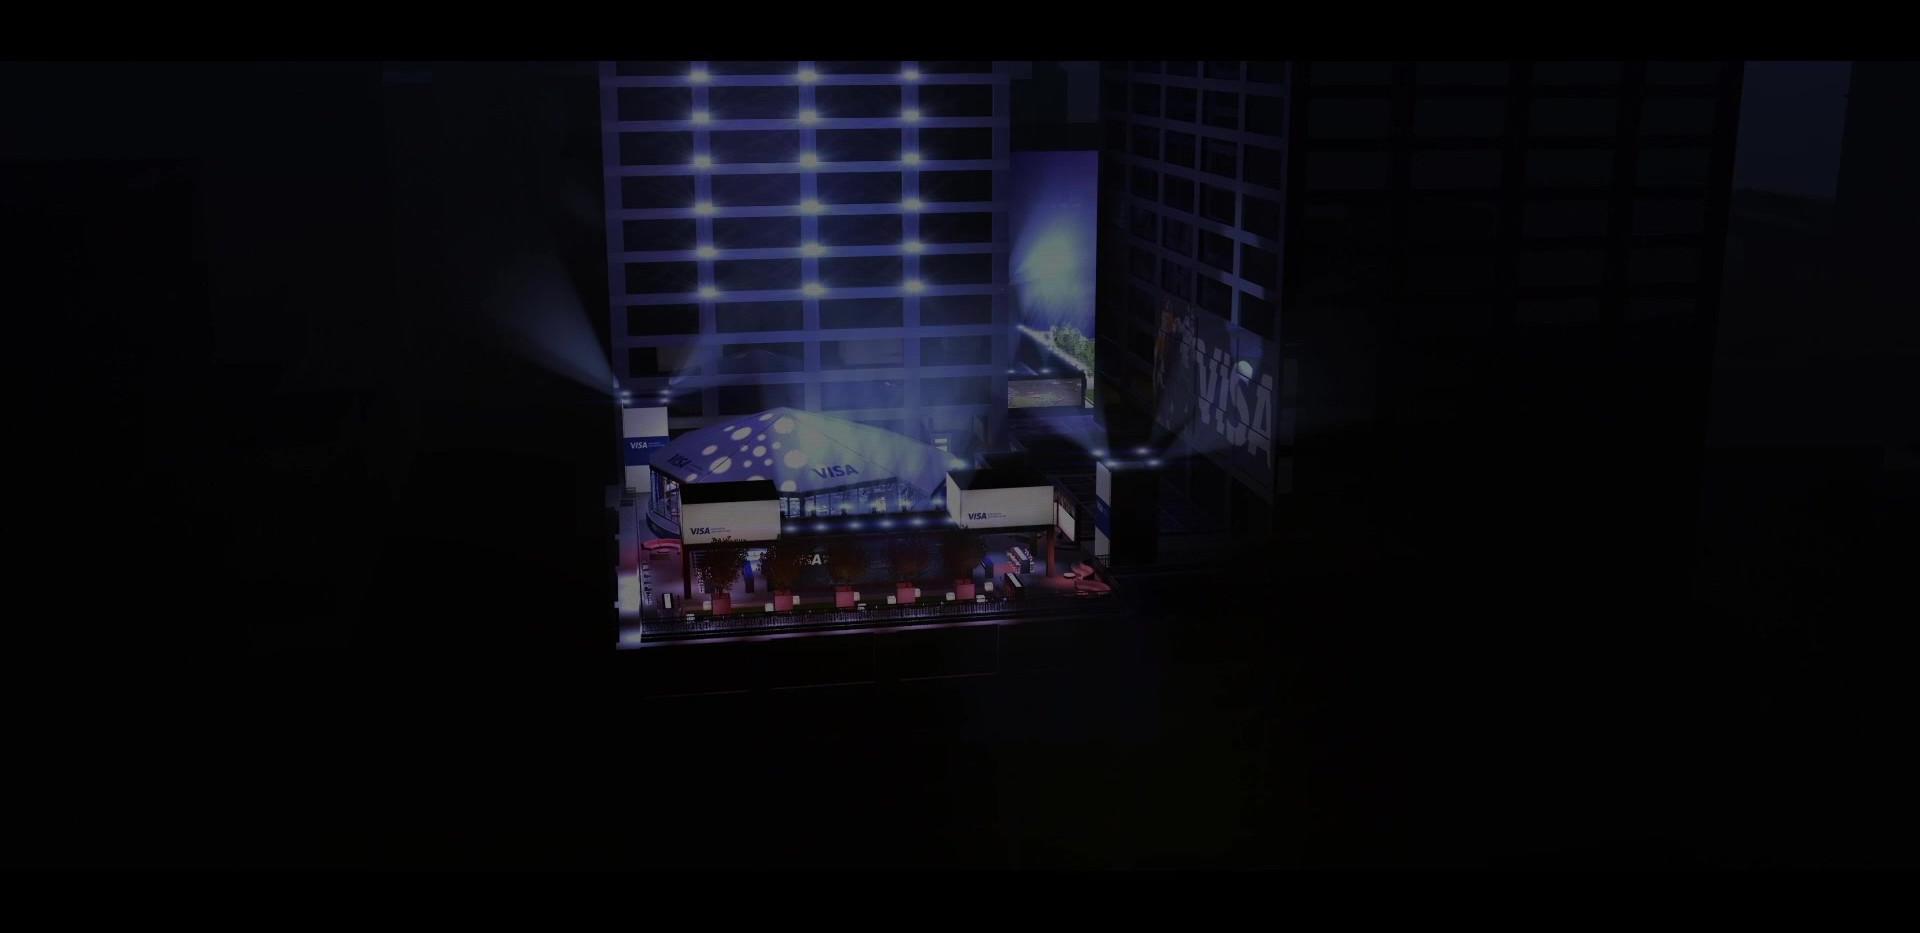 Visa_SuperBowl_Cinematic